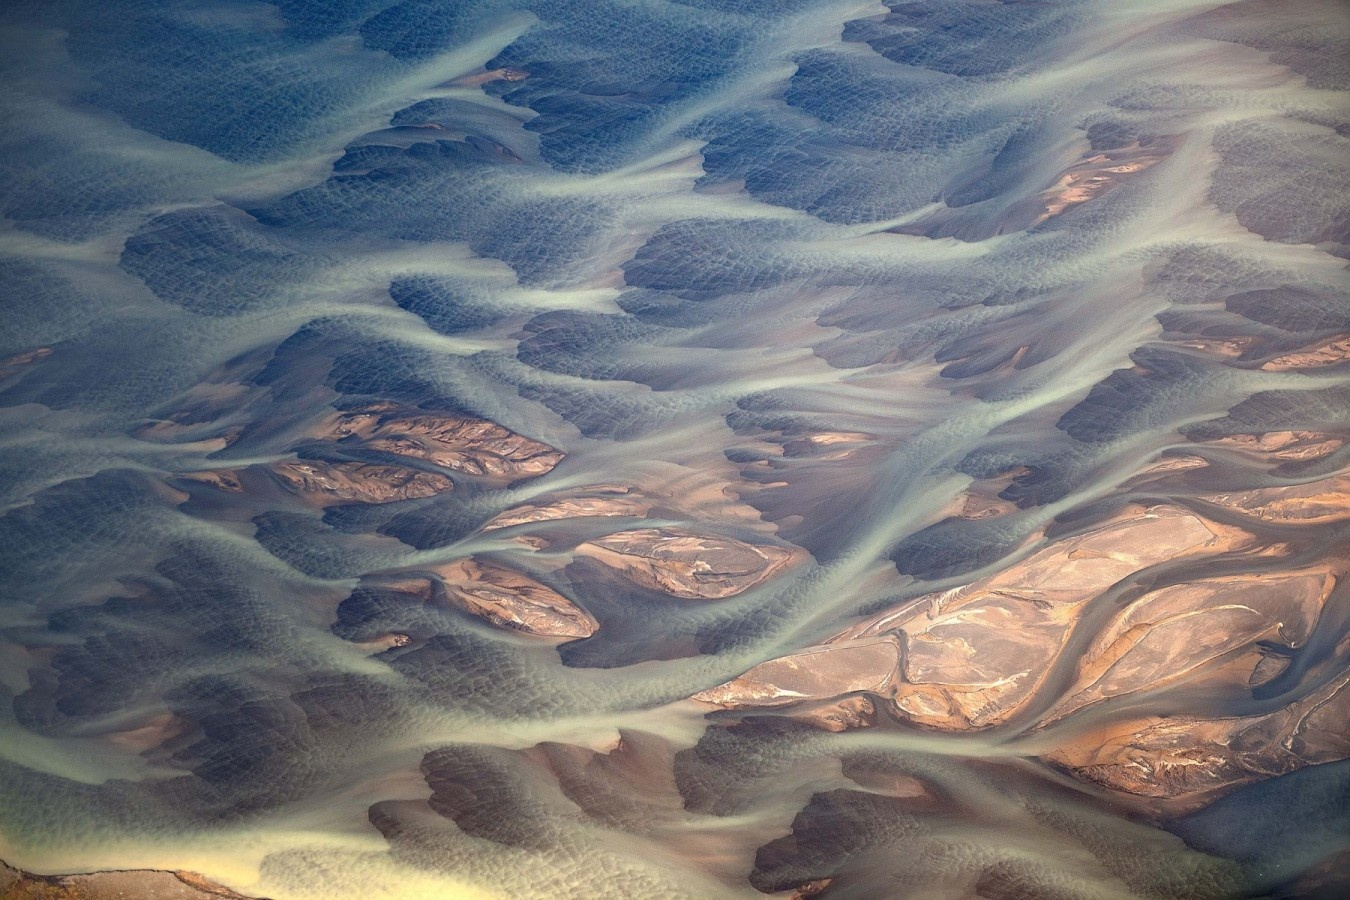 colorwaves-volcanic-river-iceland-andre-ermolaev